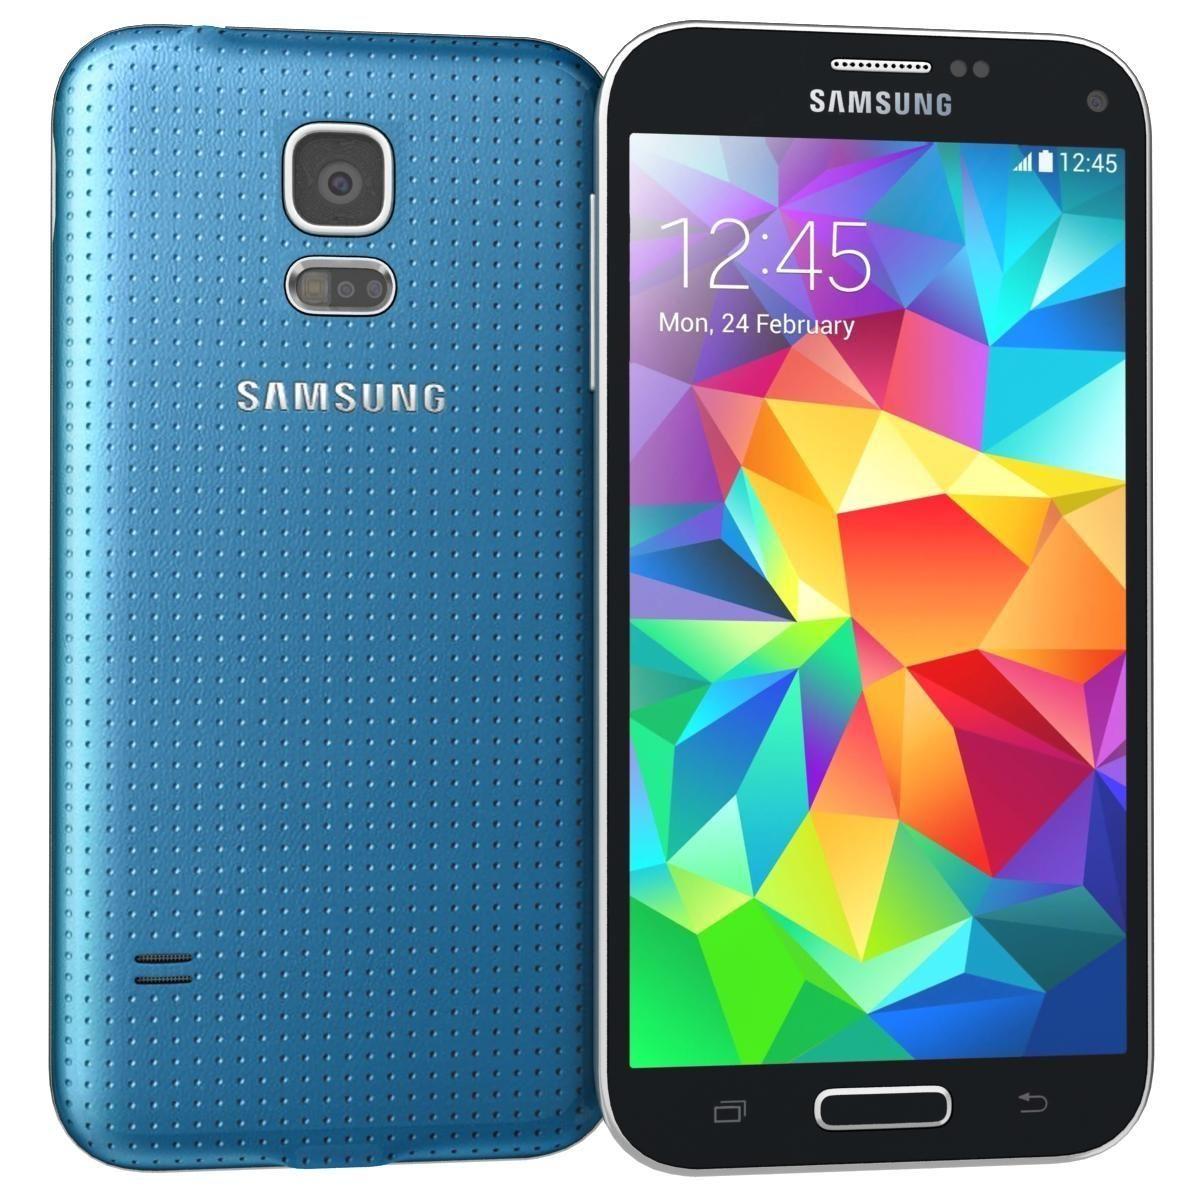 Samsung Galaxy S5 Mini Electric Blue 3d Model Ad Galaxy Samsung Mini Model New Samsung Galaxy Samsung Galaxy S5 Samsung Galaxy